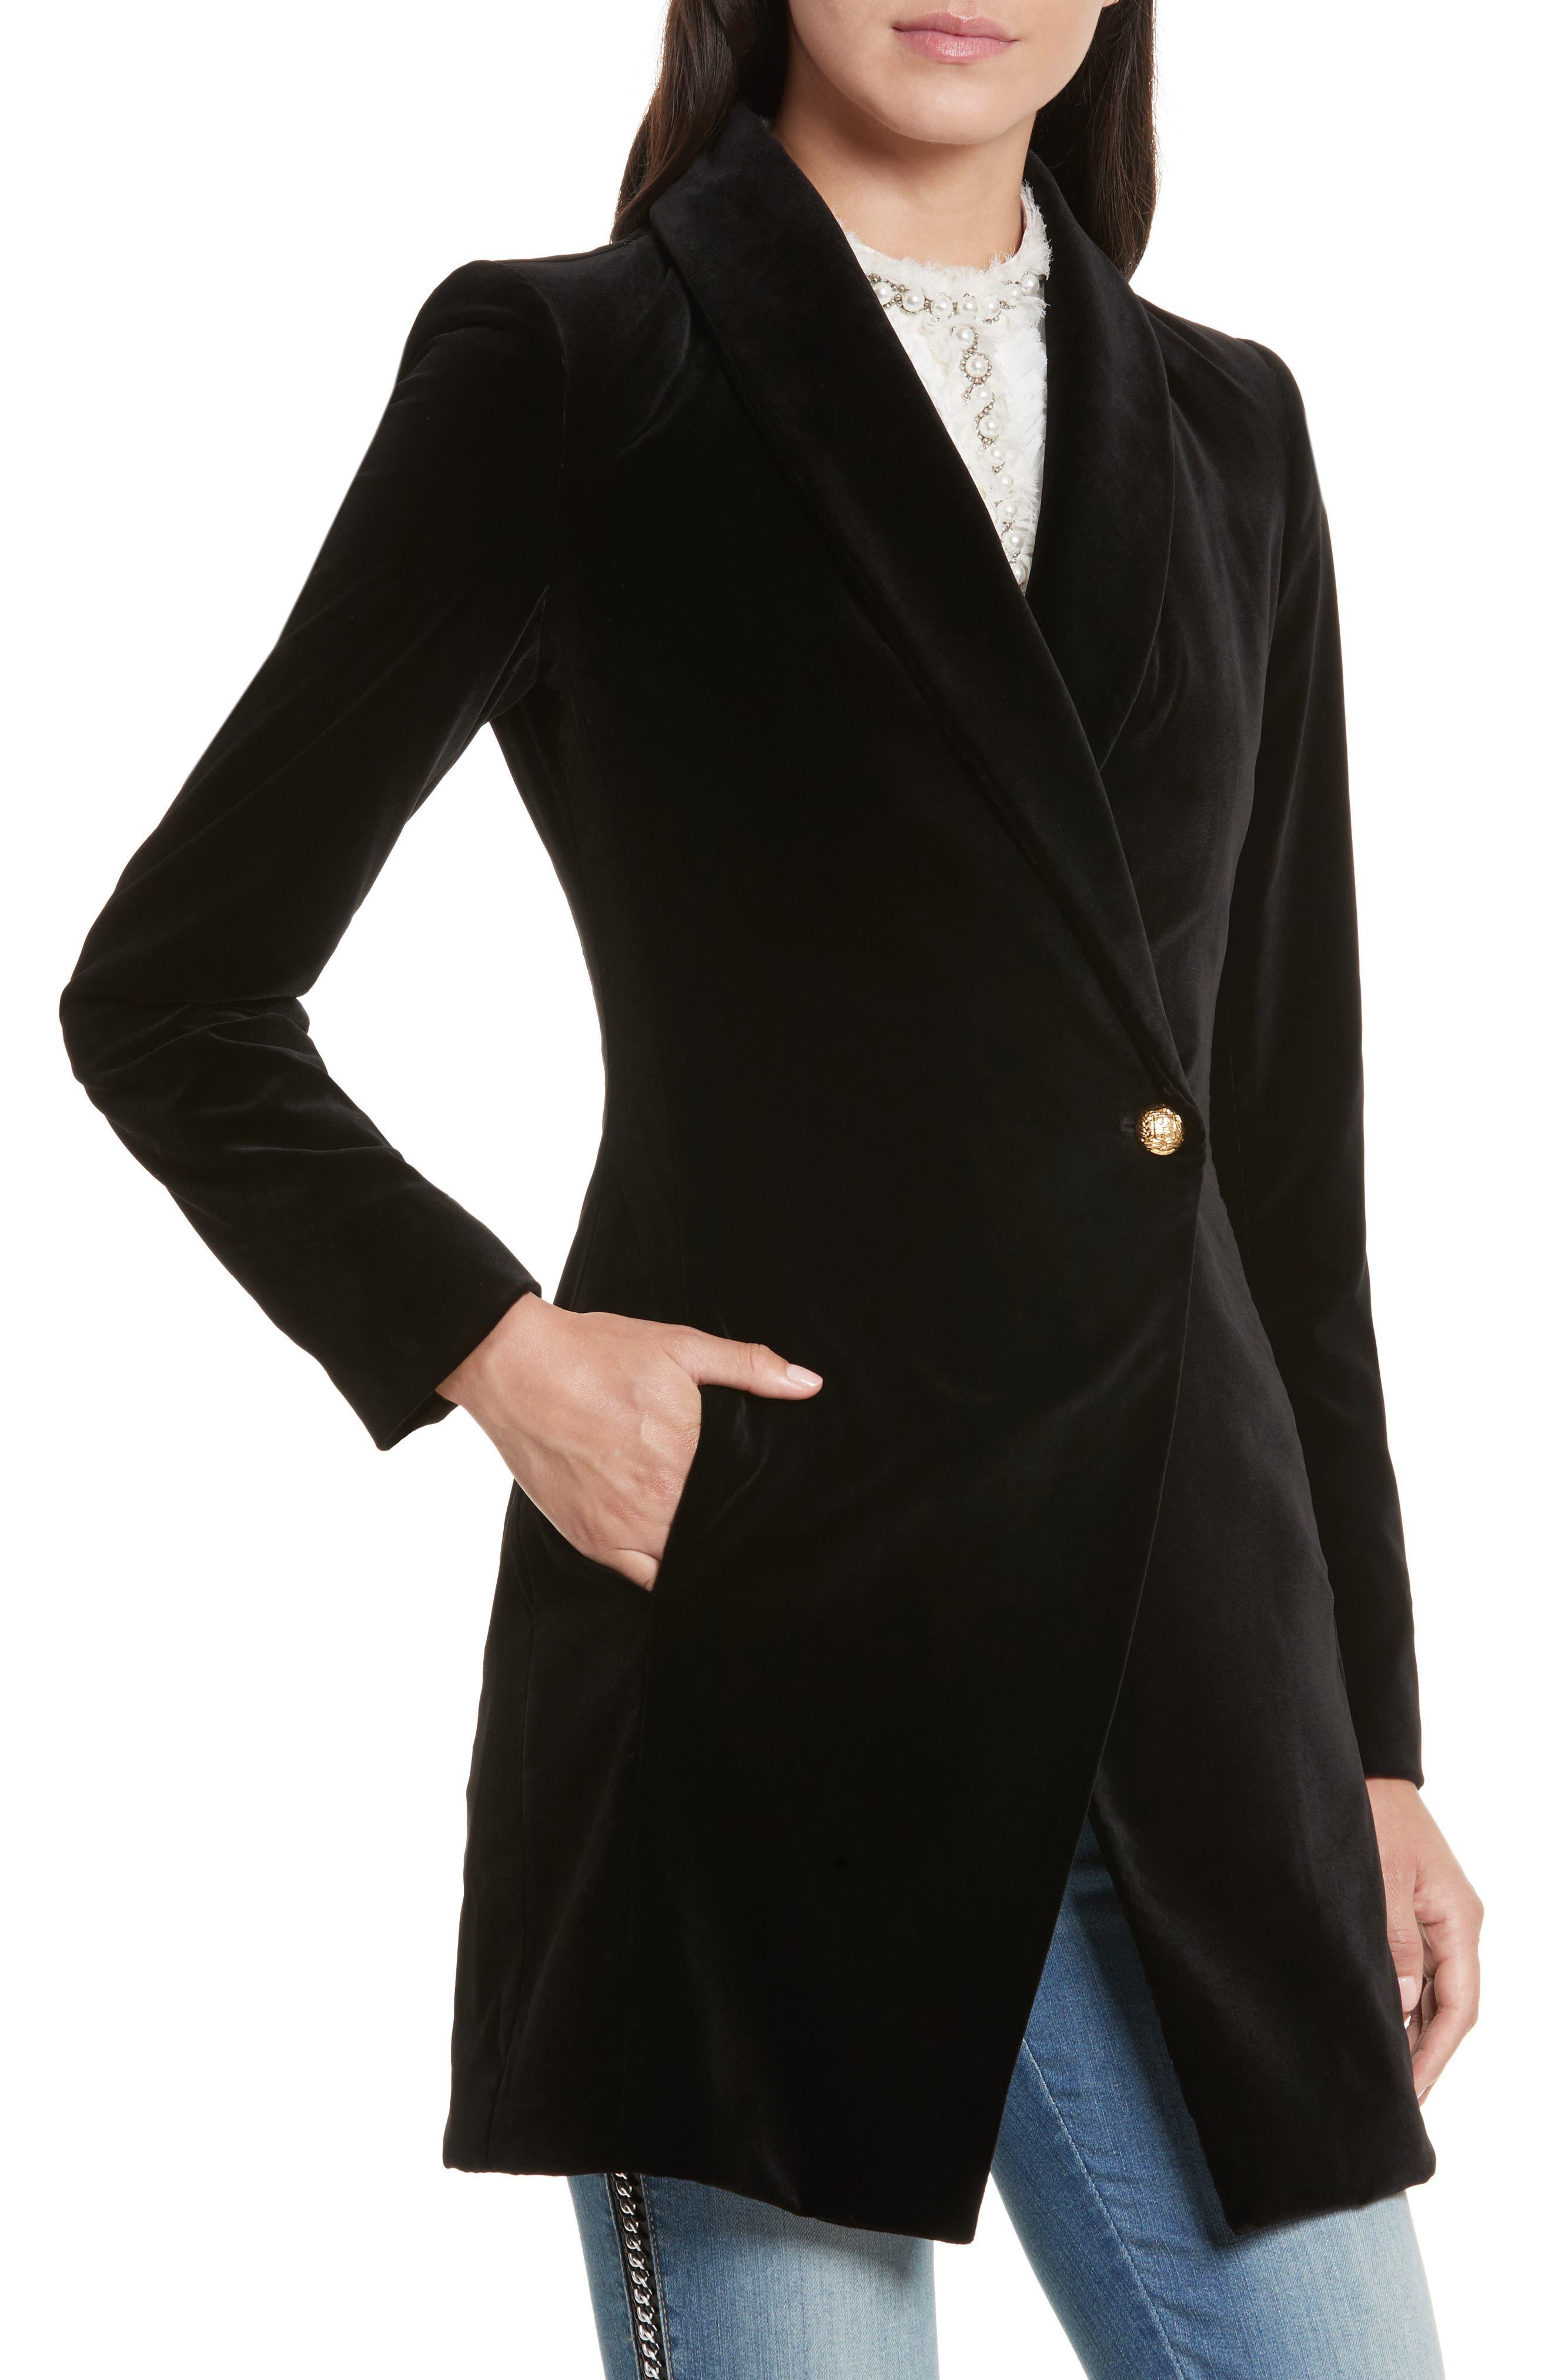 Vance Crossover Coat,                             Alternate thumbnail 4, color,                             001